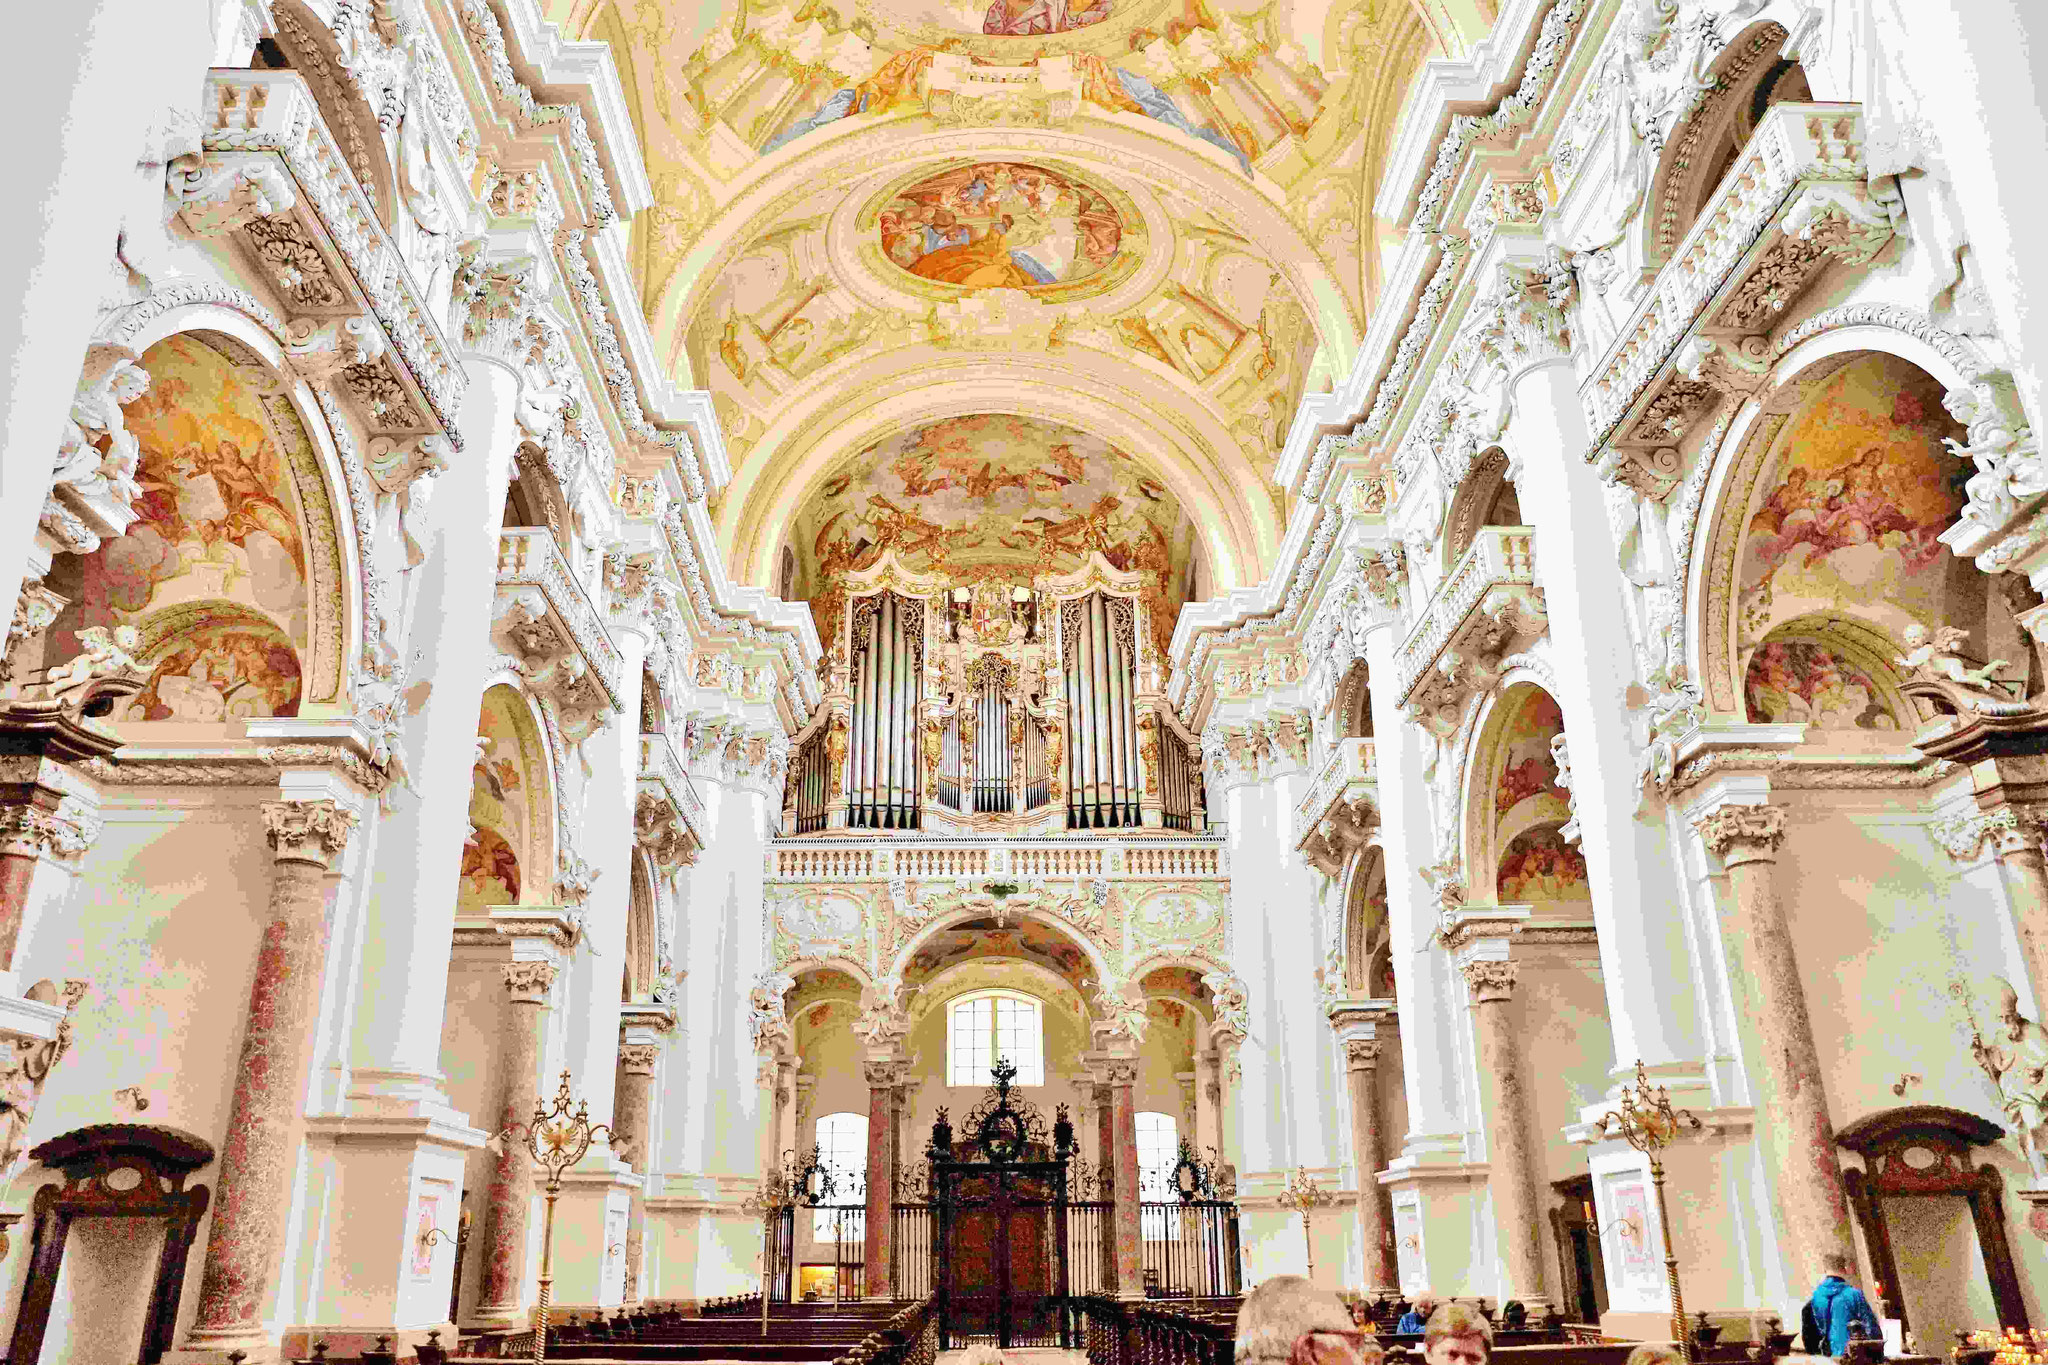 Stiftskirche St. Florian mit der berühmten Bruckner-Orgel